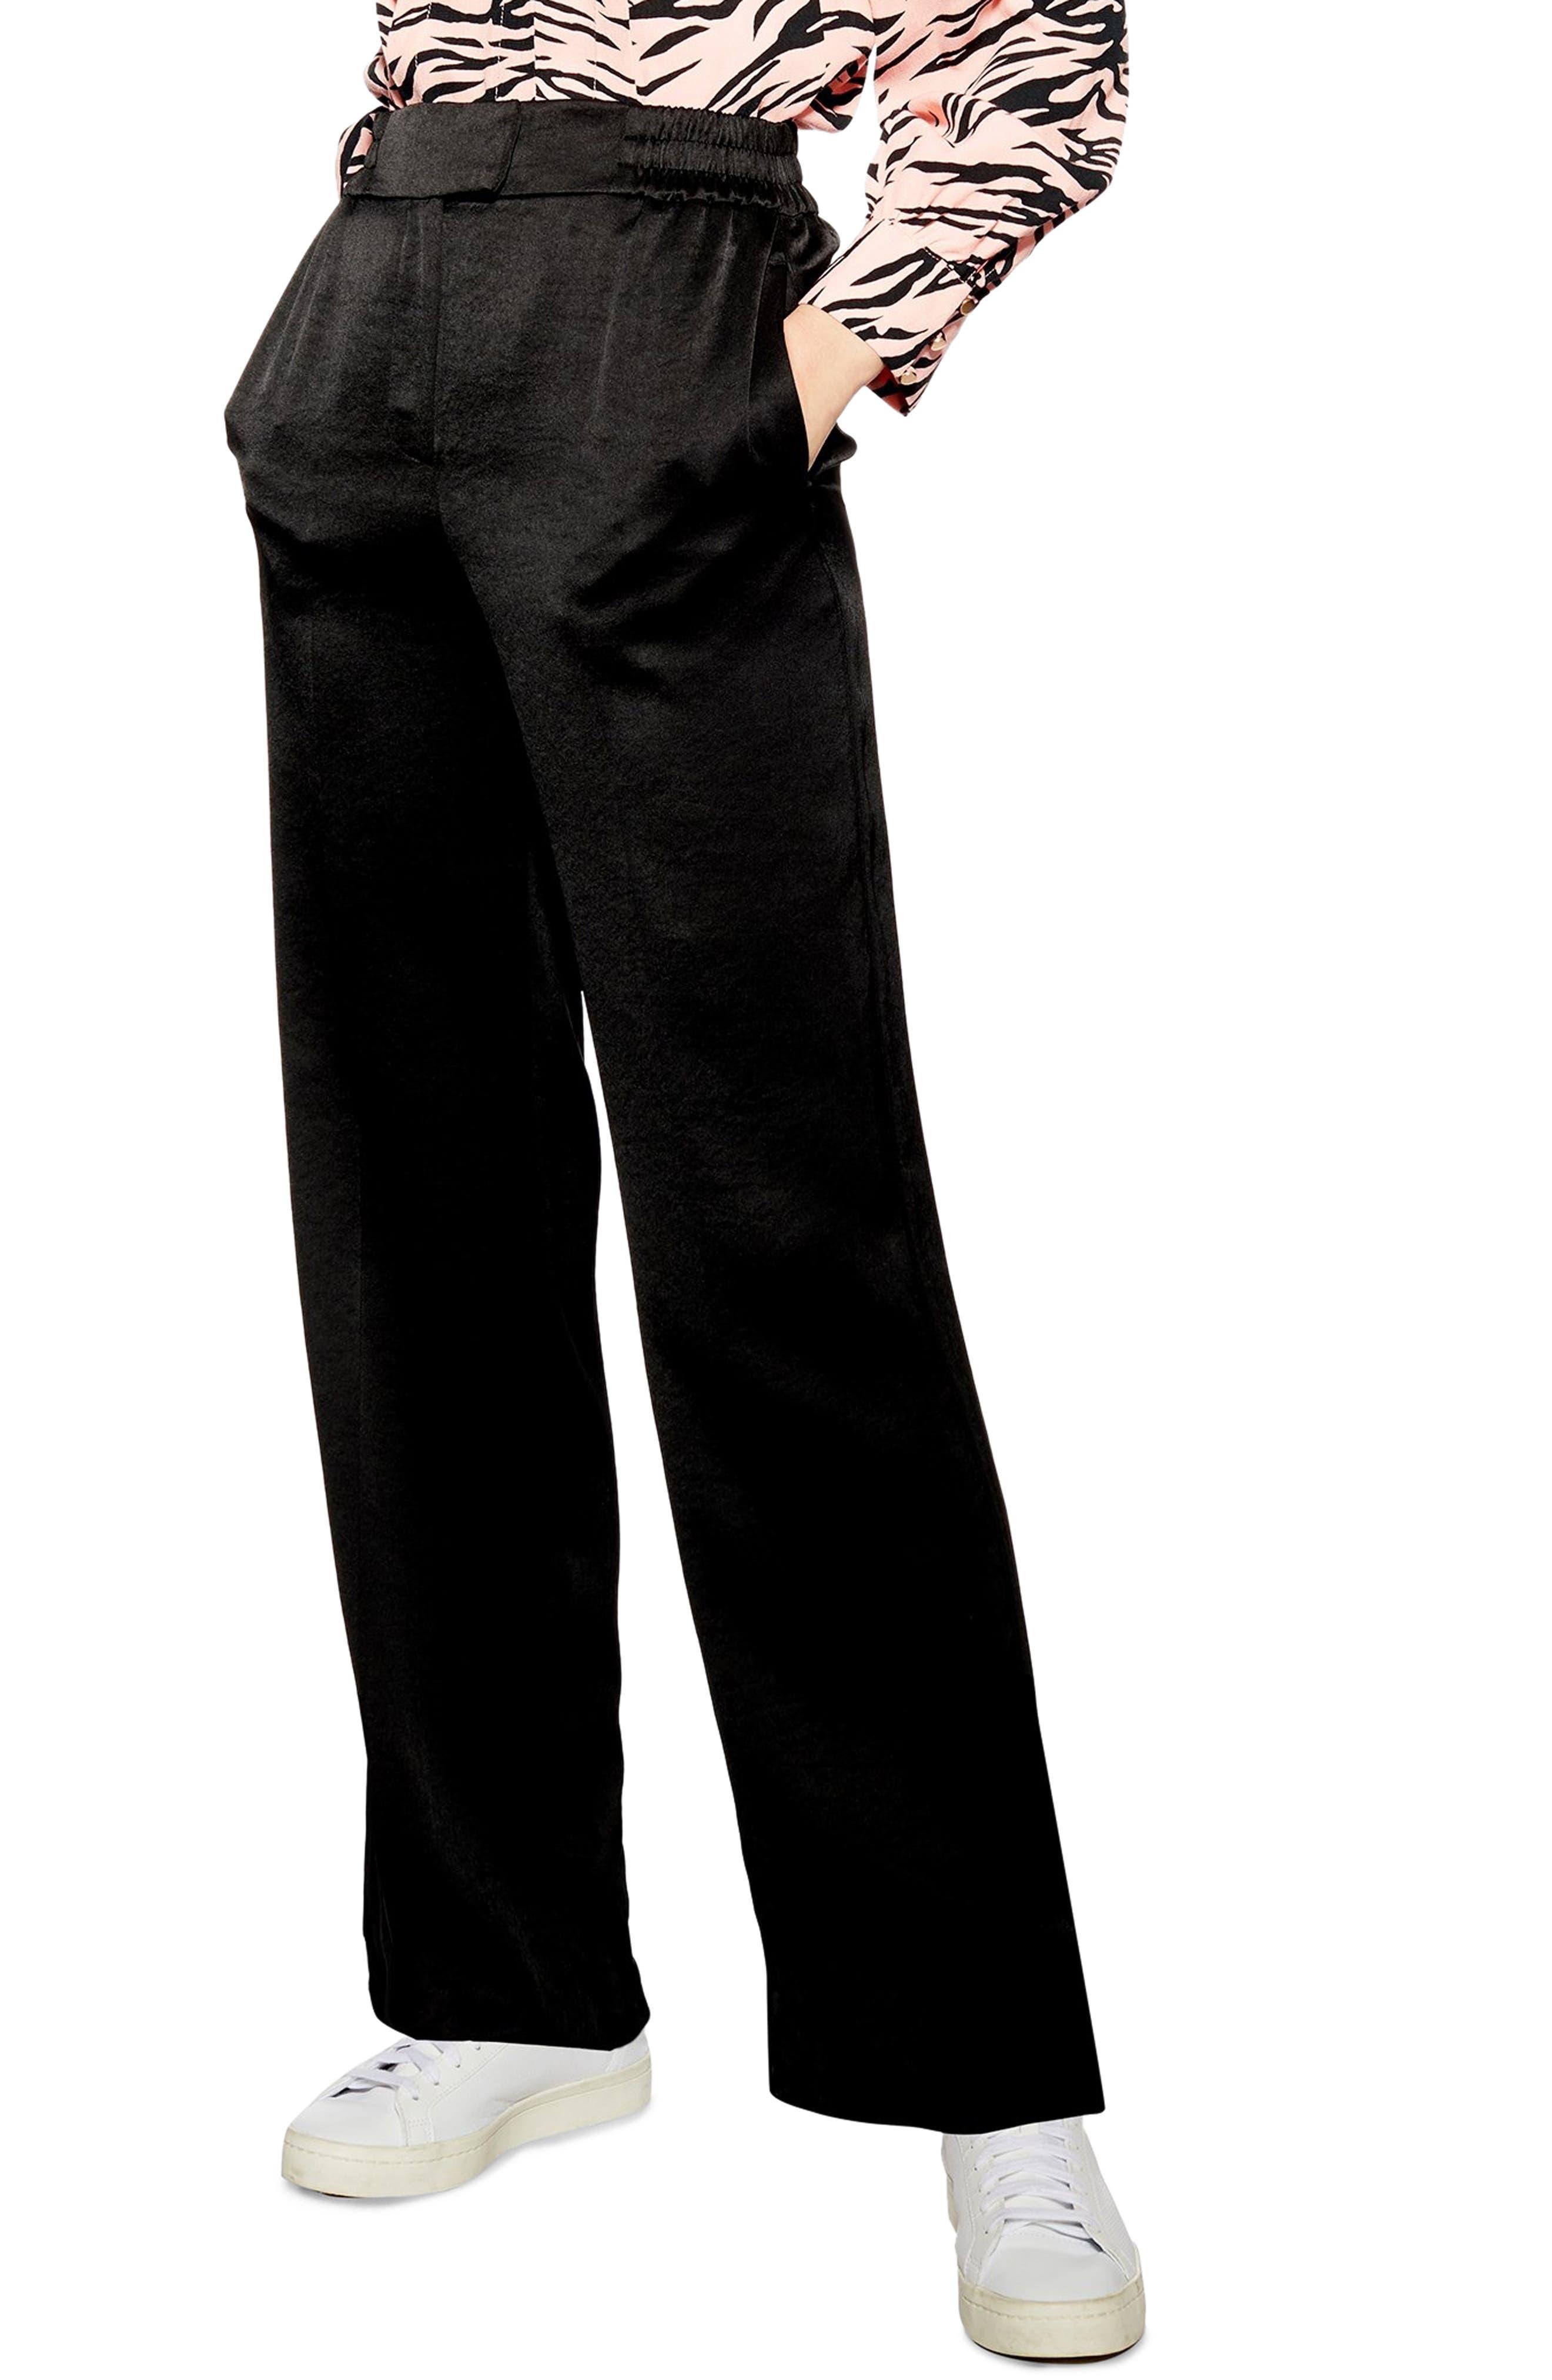 TOPSHOP Elastic Satin Trousers, Main, color, 001